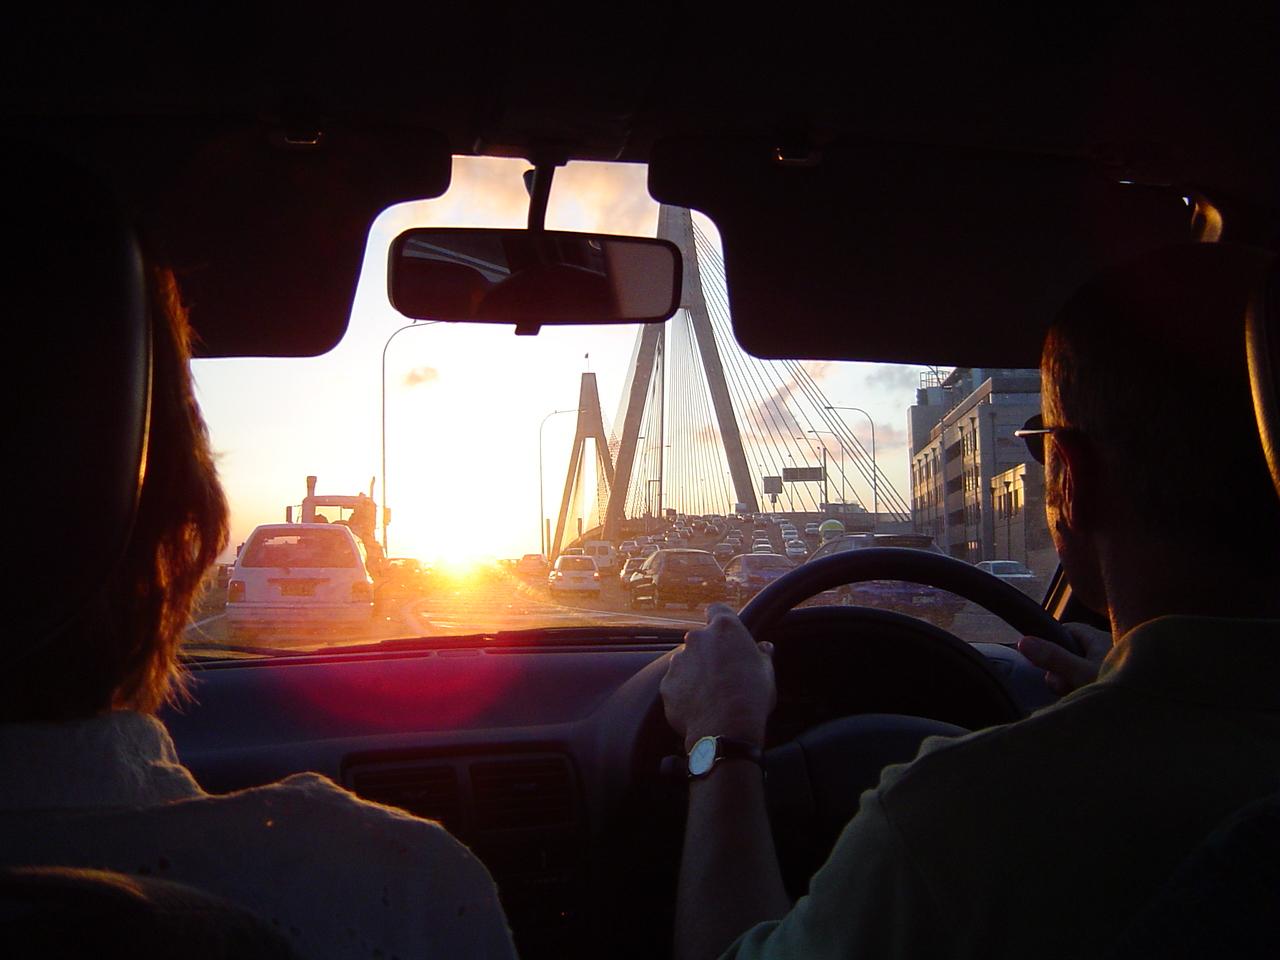 [ANZAC+Bridge+from+Greg+and+Kerrie]